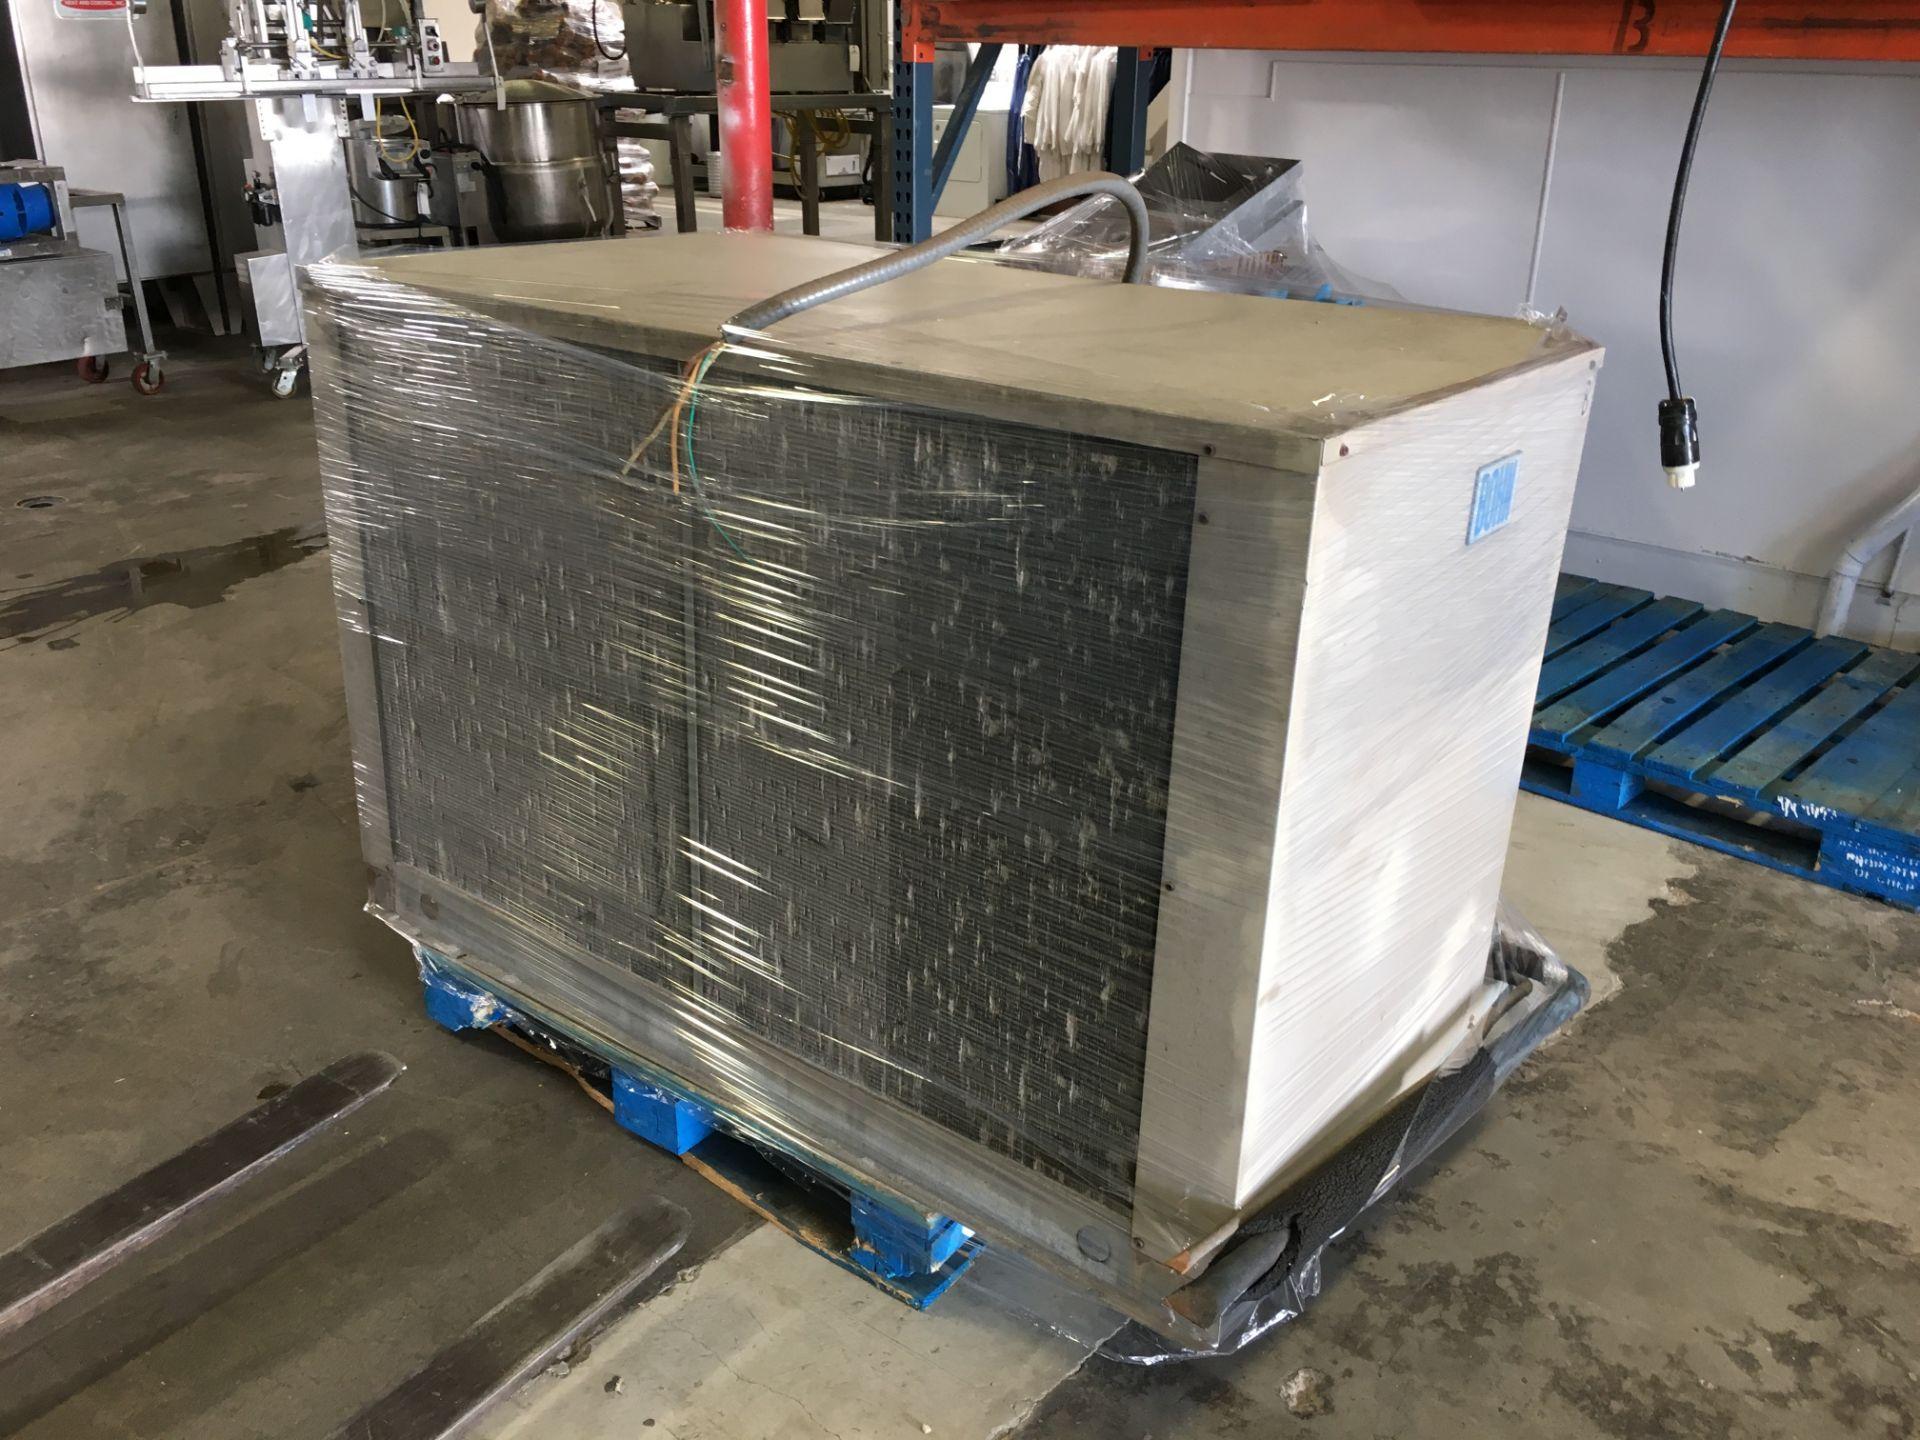 Lot 62 - Bohn Heatcraft Model BDT1000H2D, Refrigeration Compressor, 460V, 3ph, 60Hz, Inc | Rig Fee: No Charge